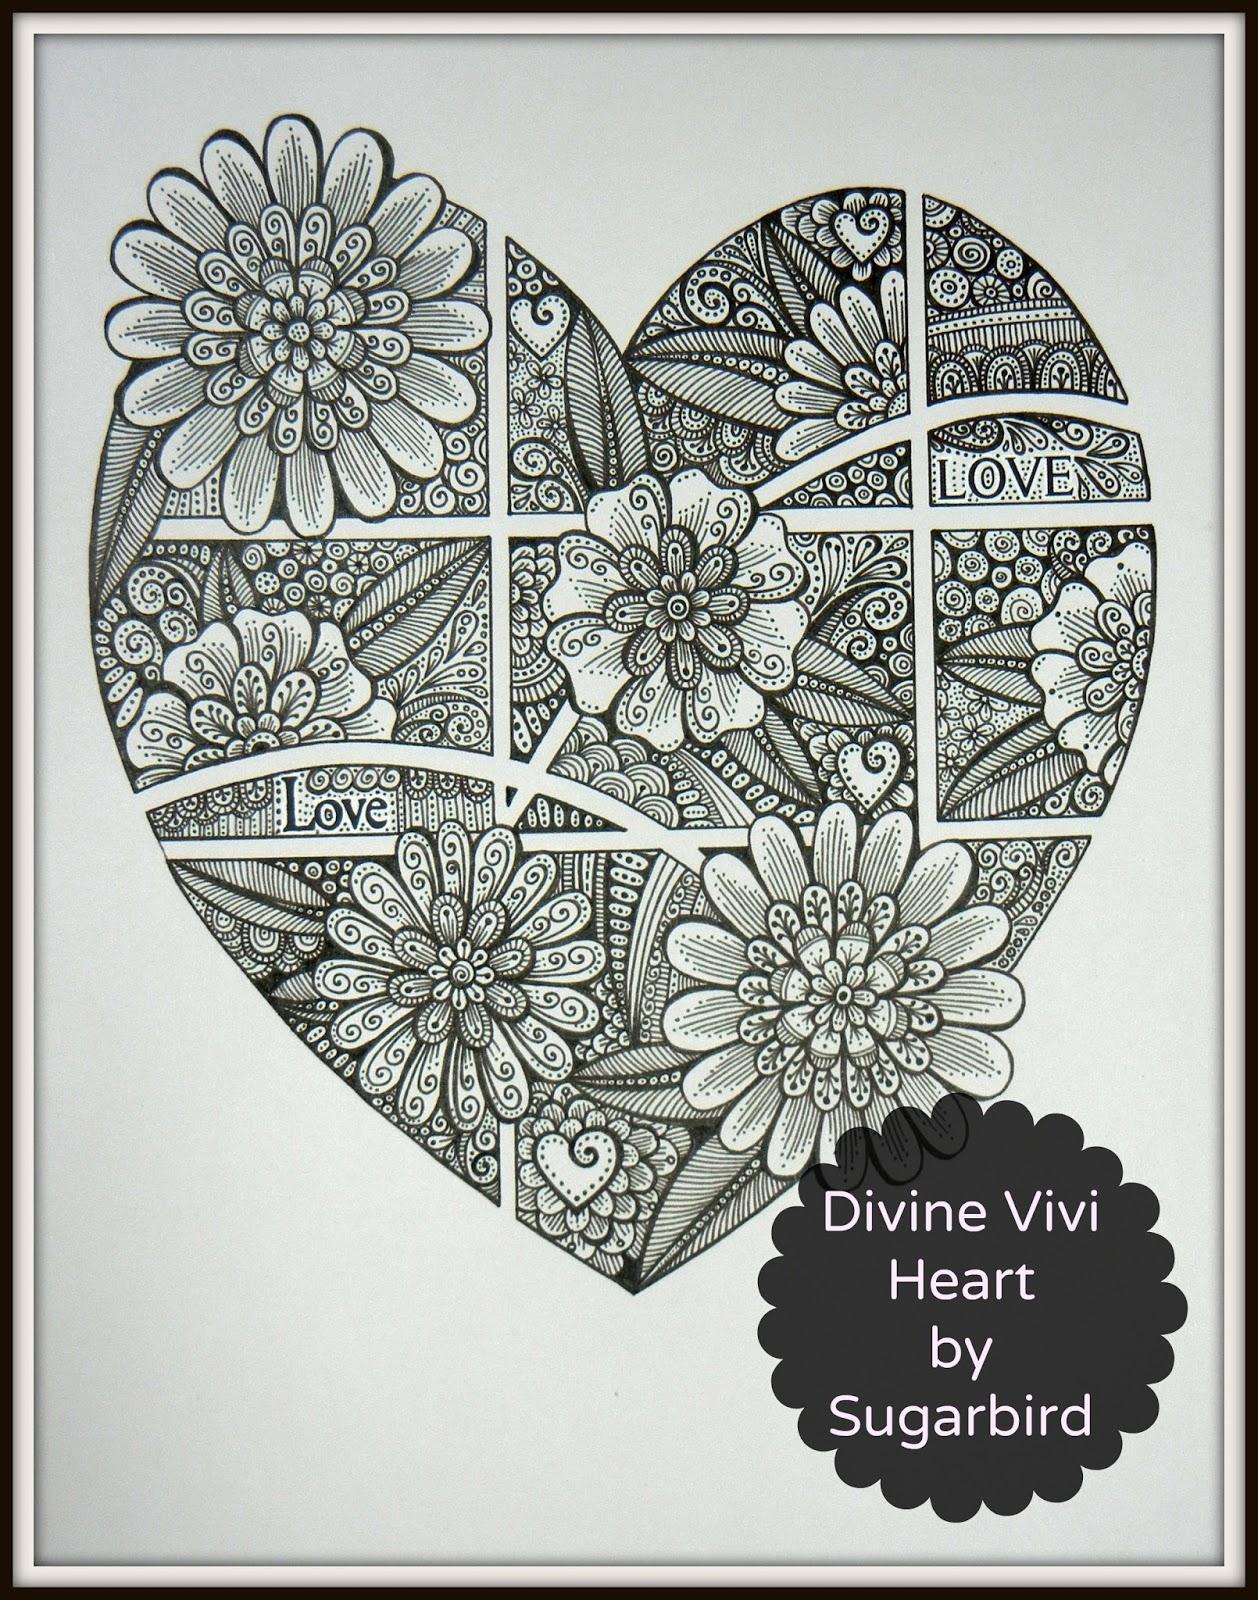 Sugarbird: Divine Vivi Heart